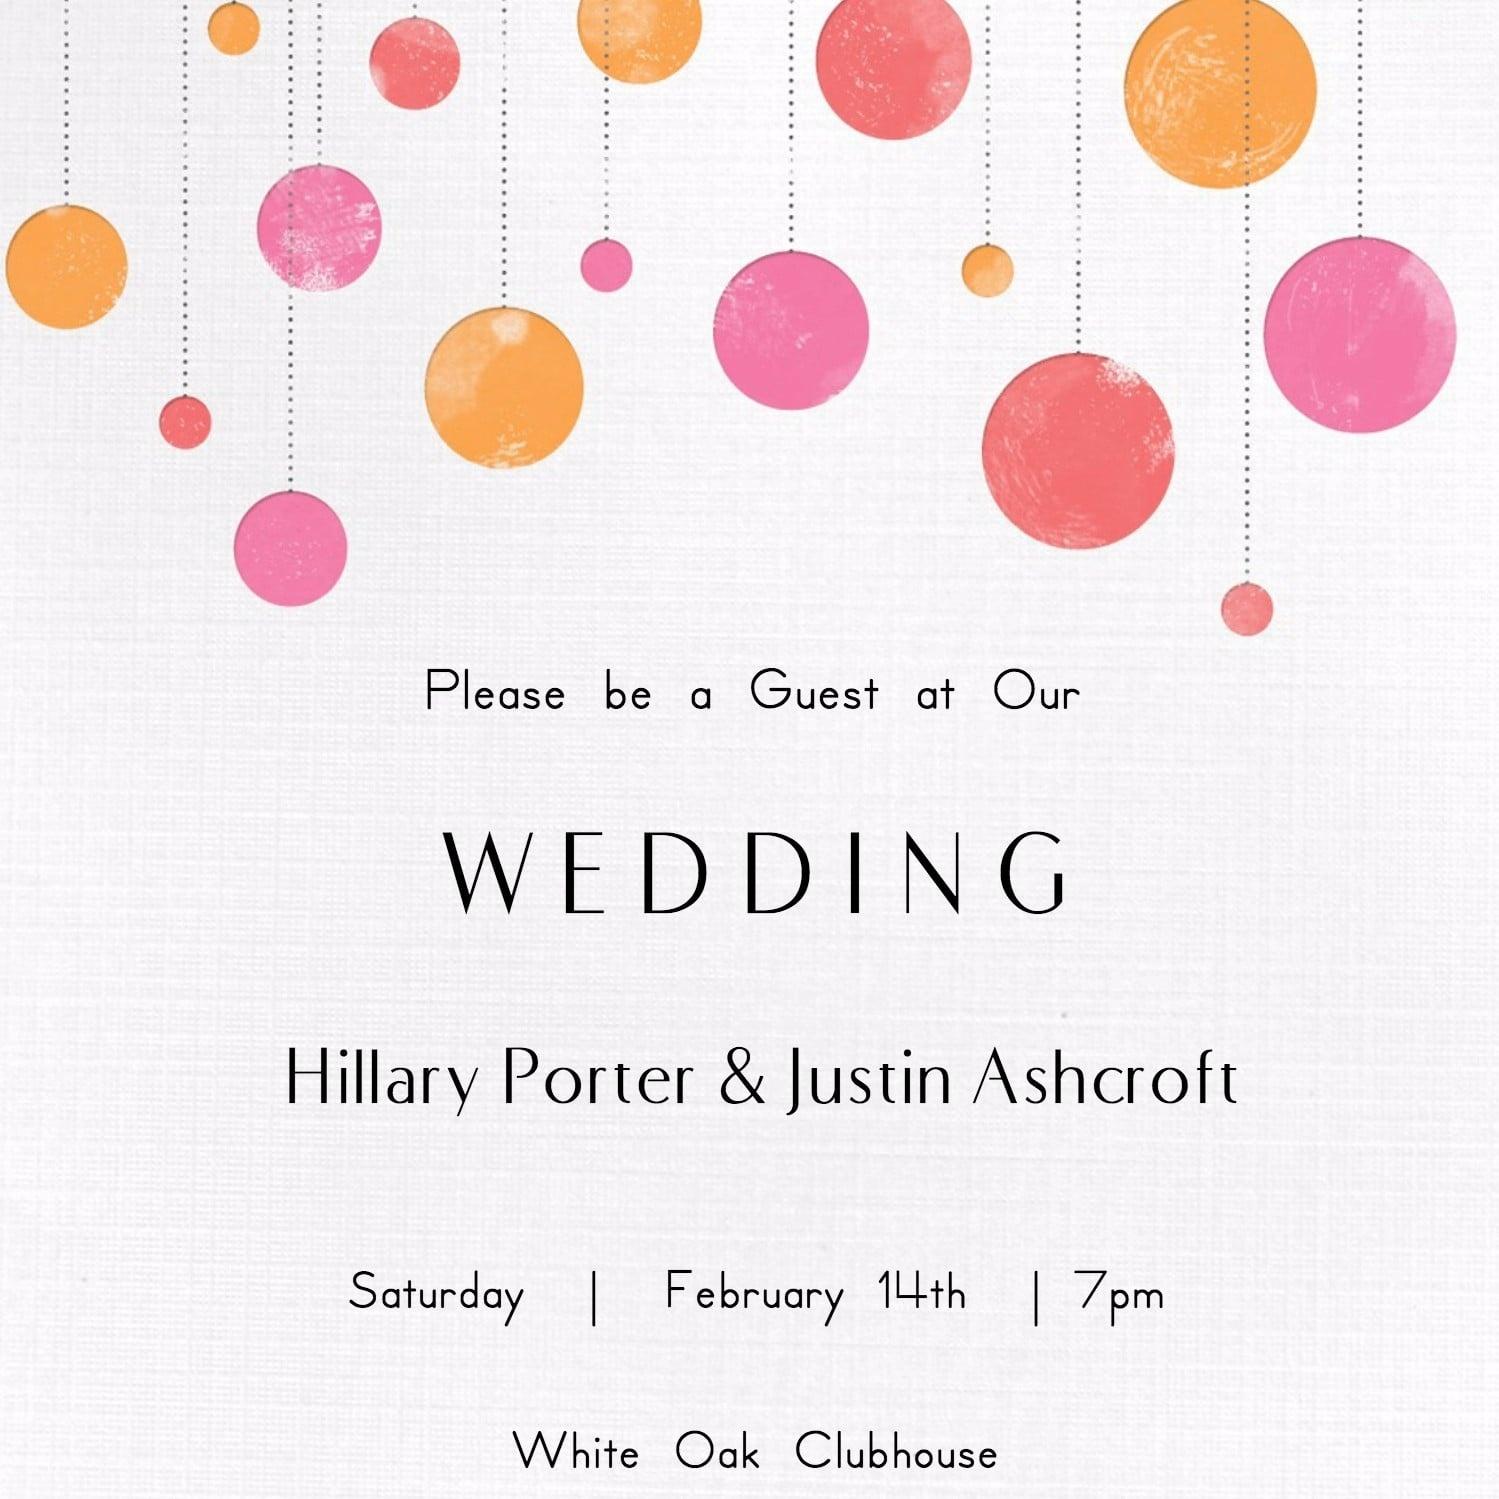 Free Printable Wedding Invitations | Popsugar Smart Living - Free Printable Wedding Cards